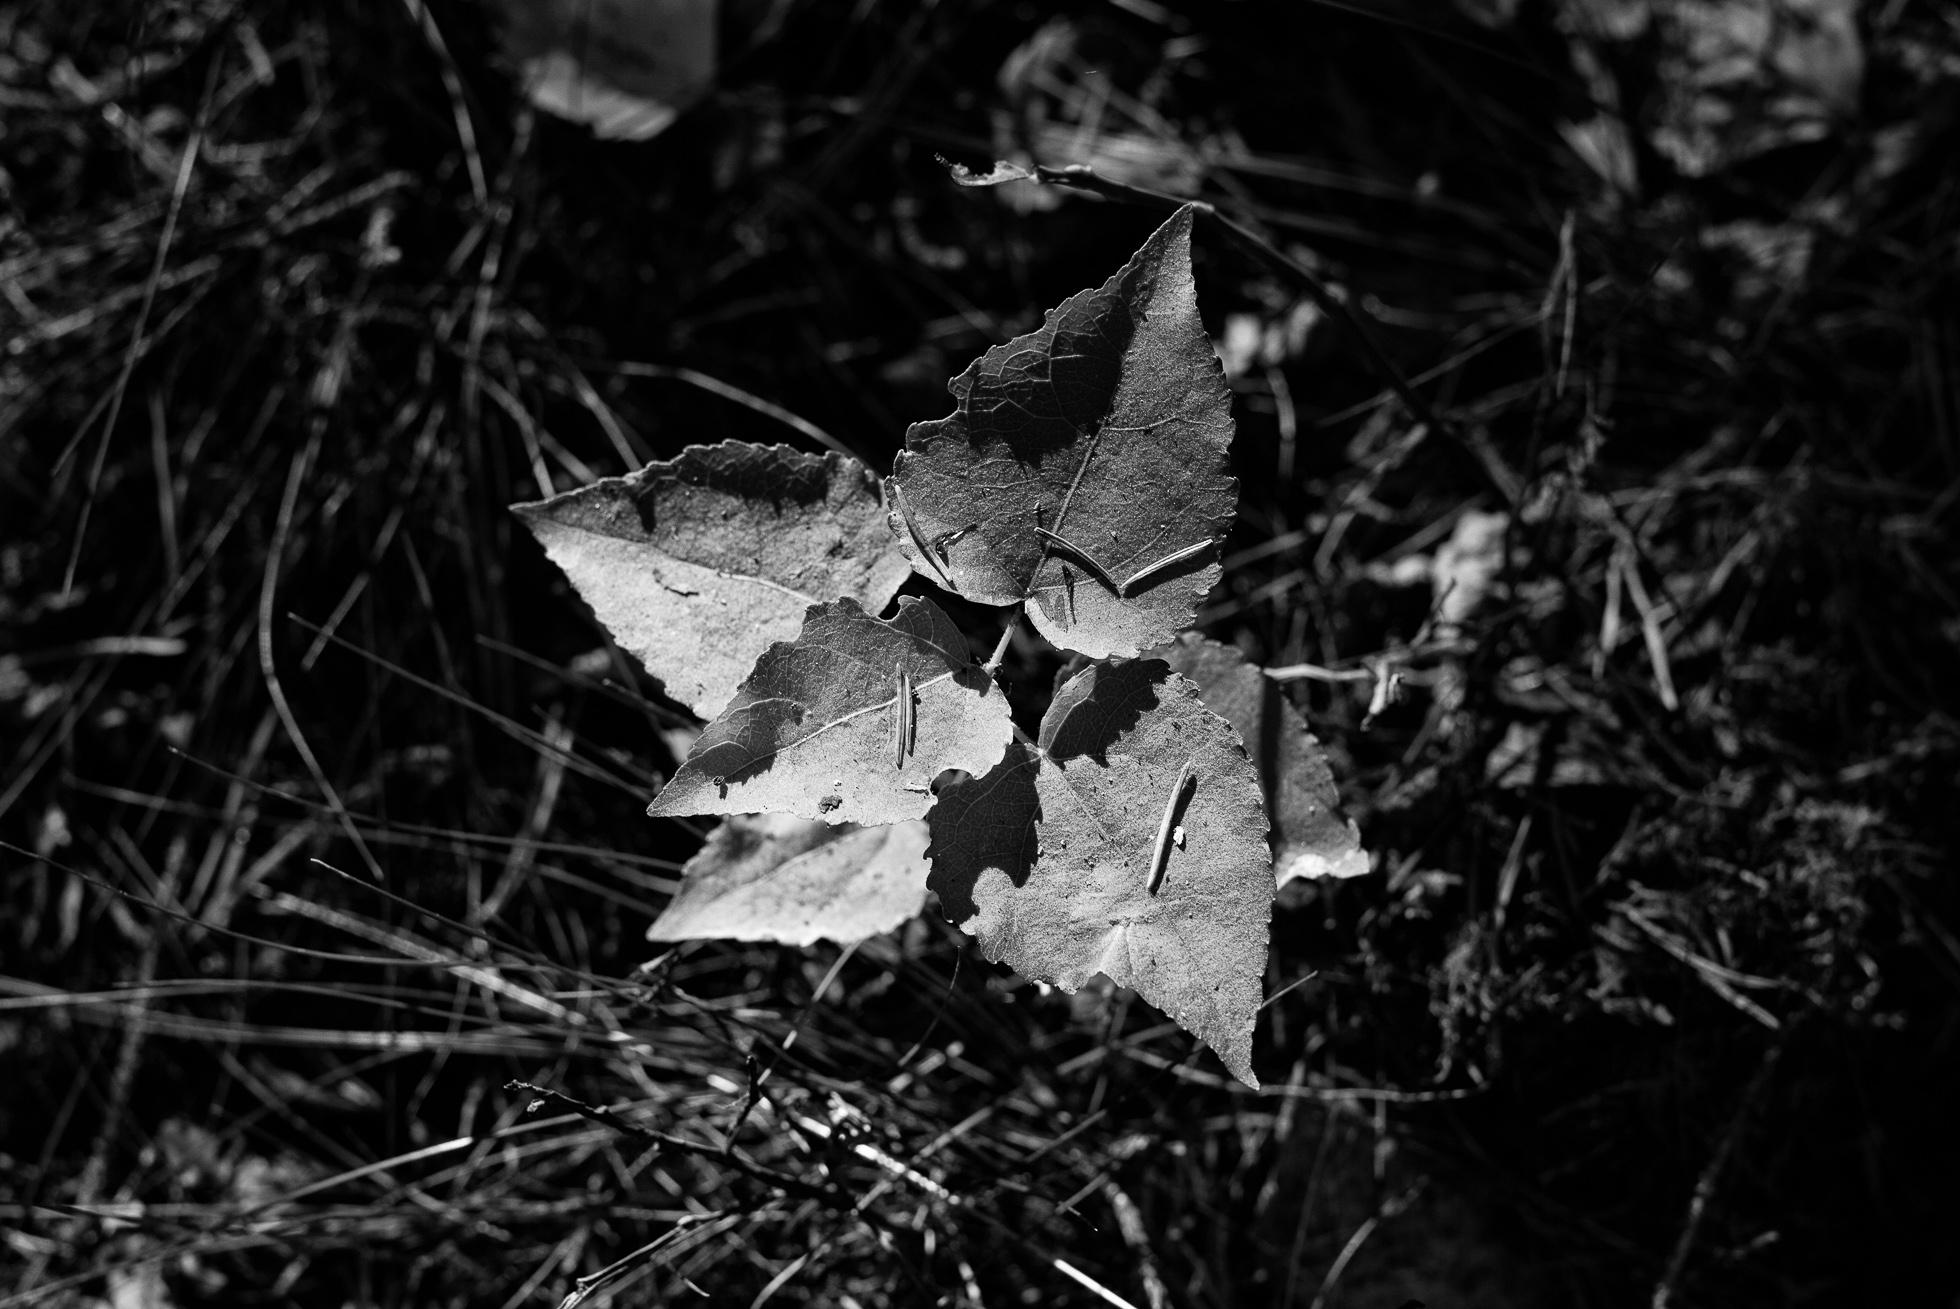 2016-10-01-skogspromenad-mortsjon__2016-10-01__0035-redigera